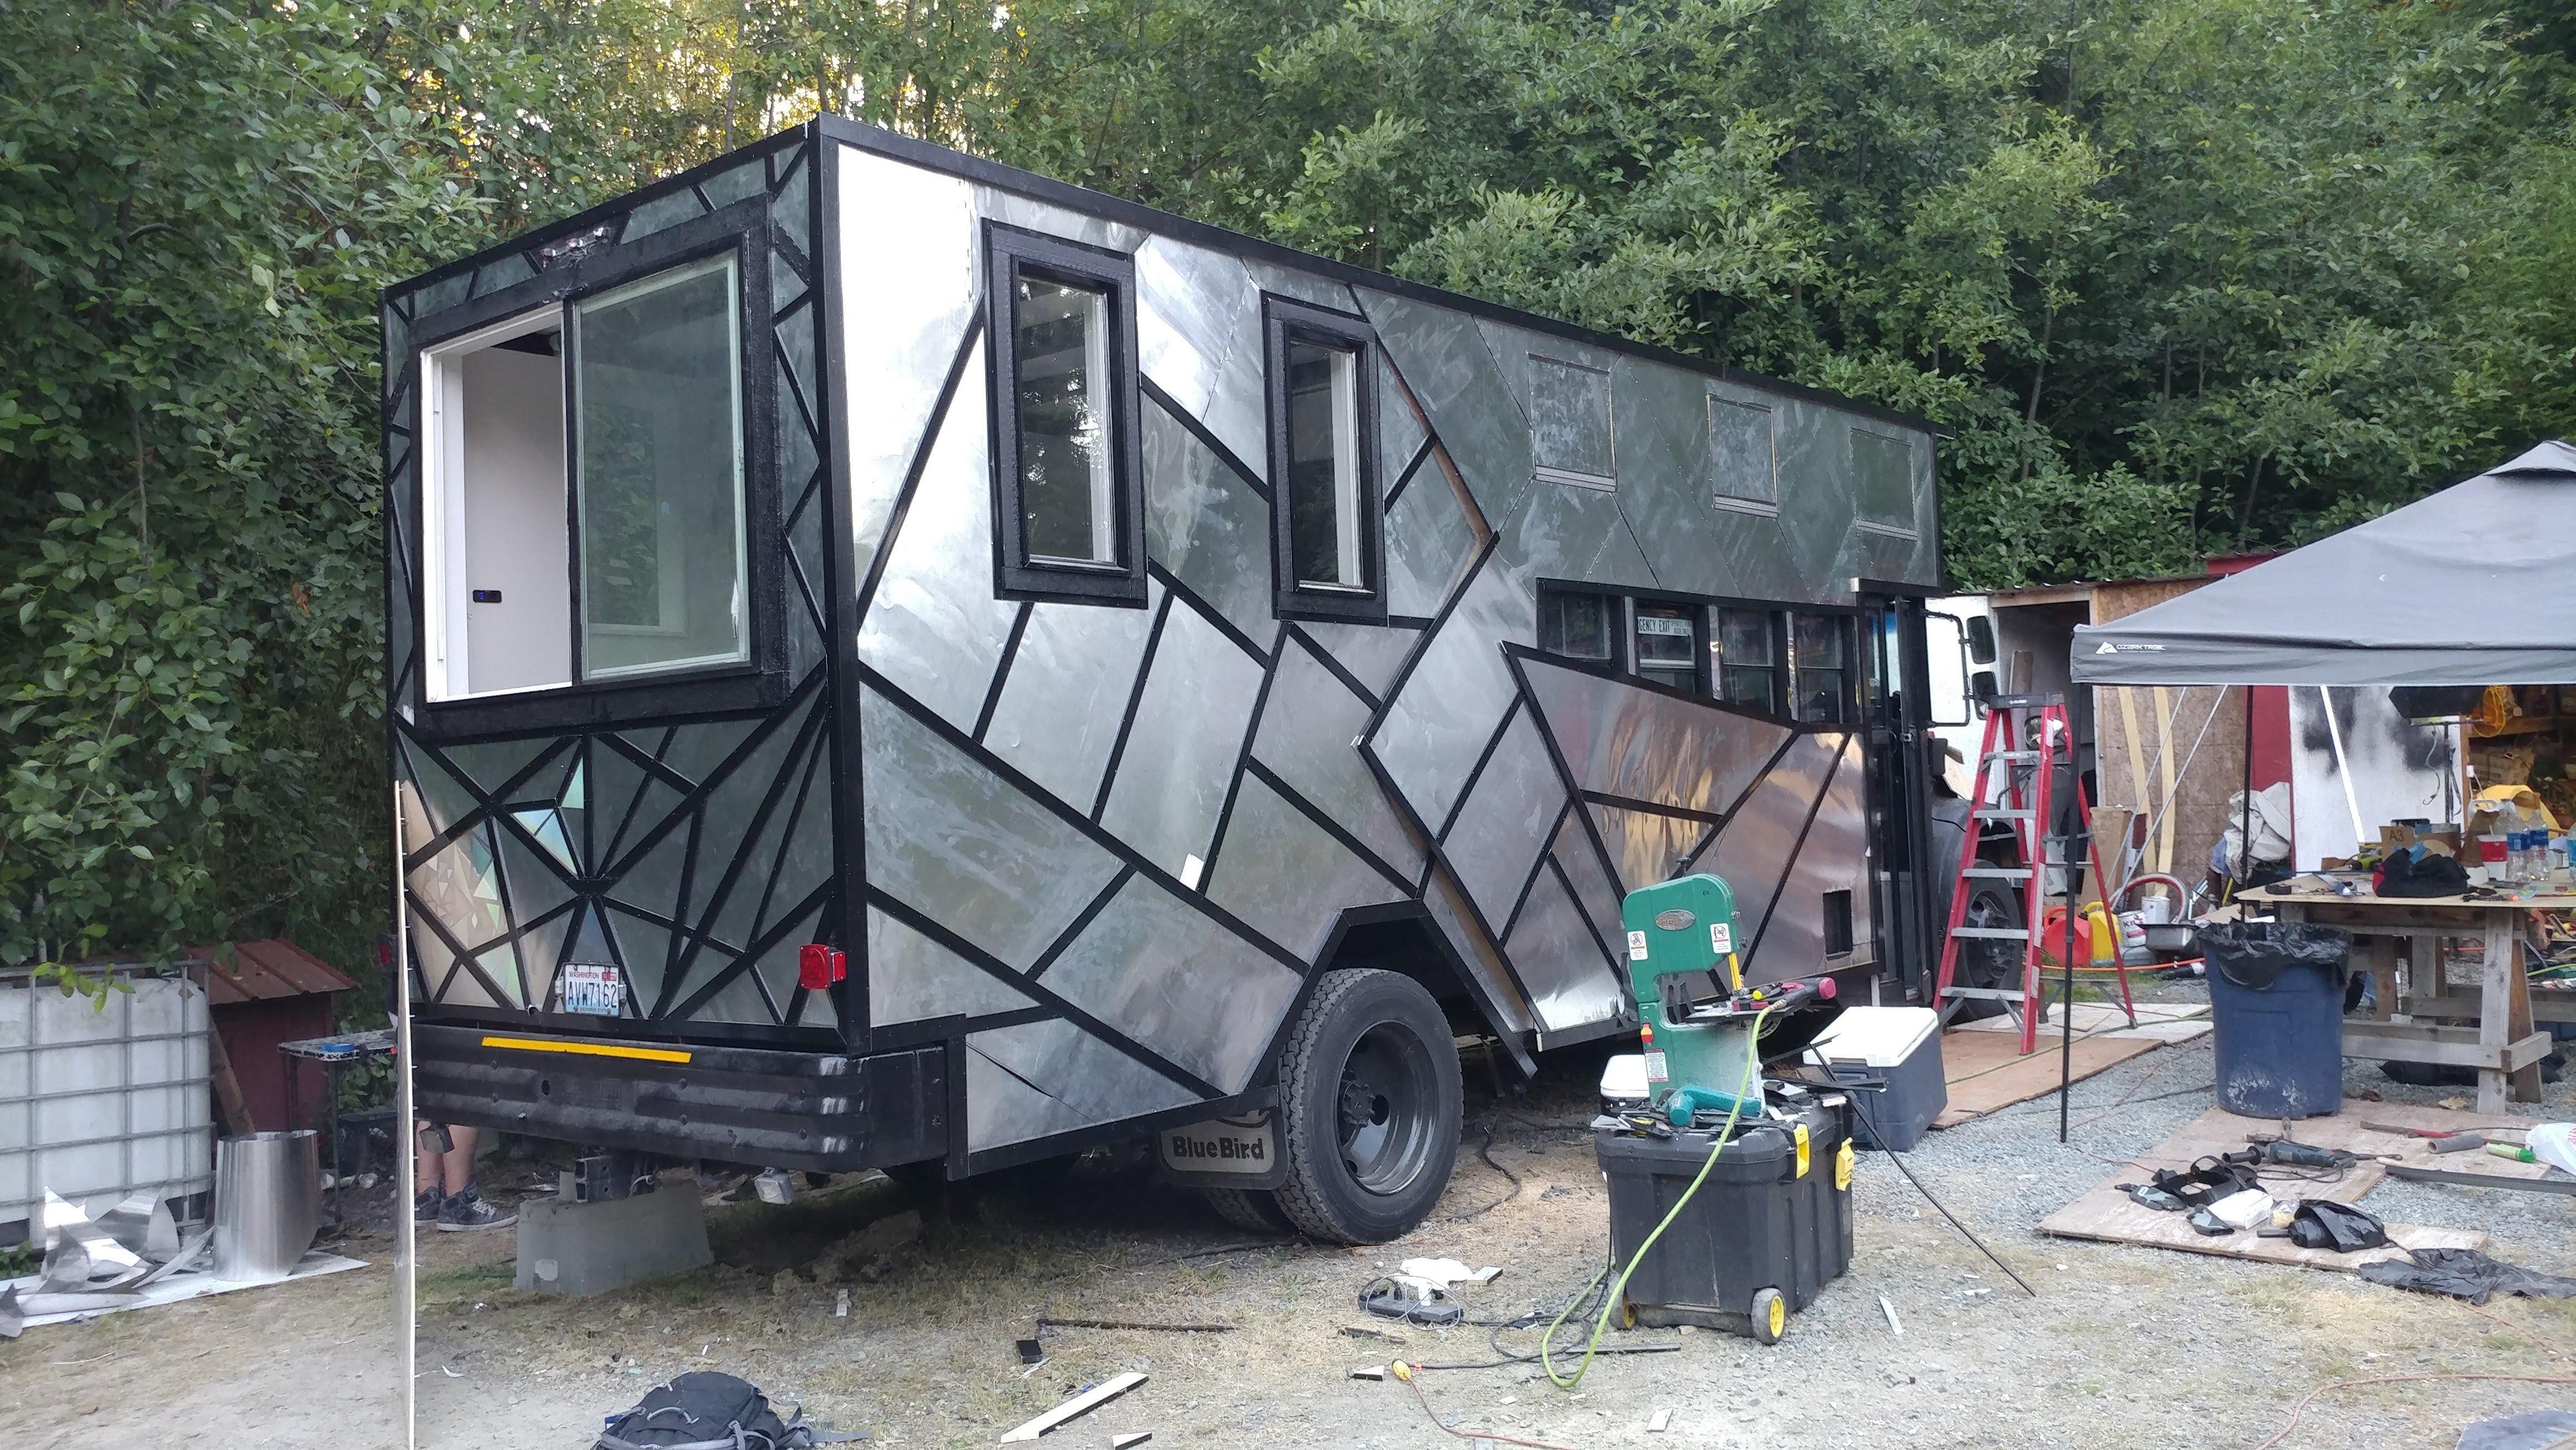 Rynobus RV construction